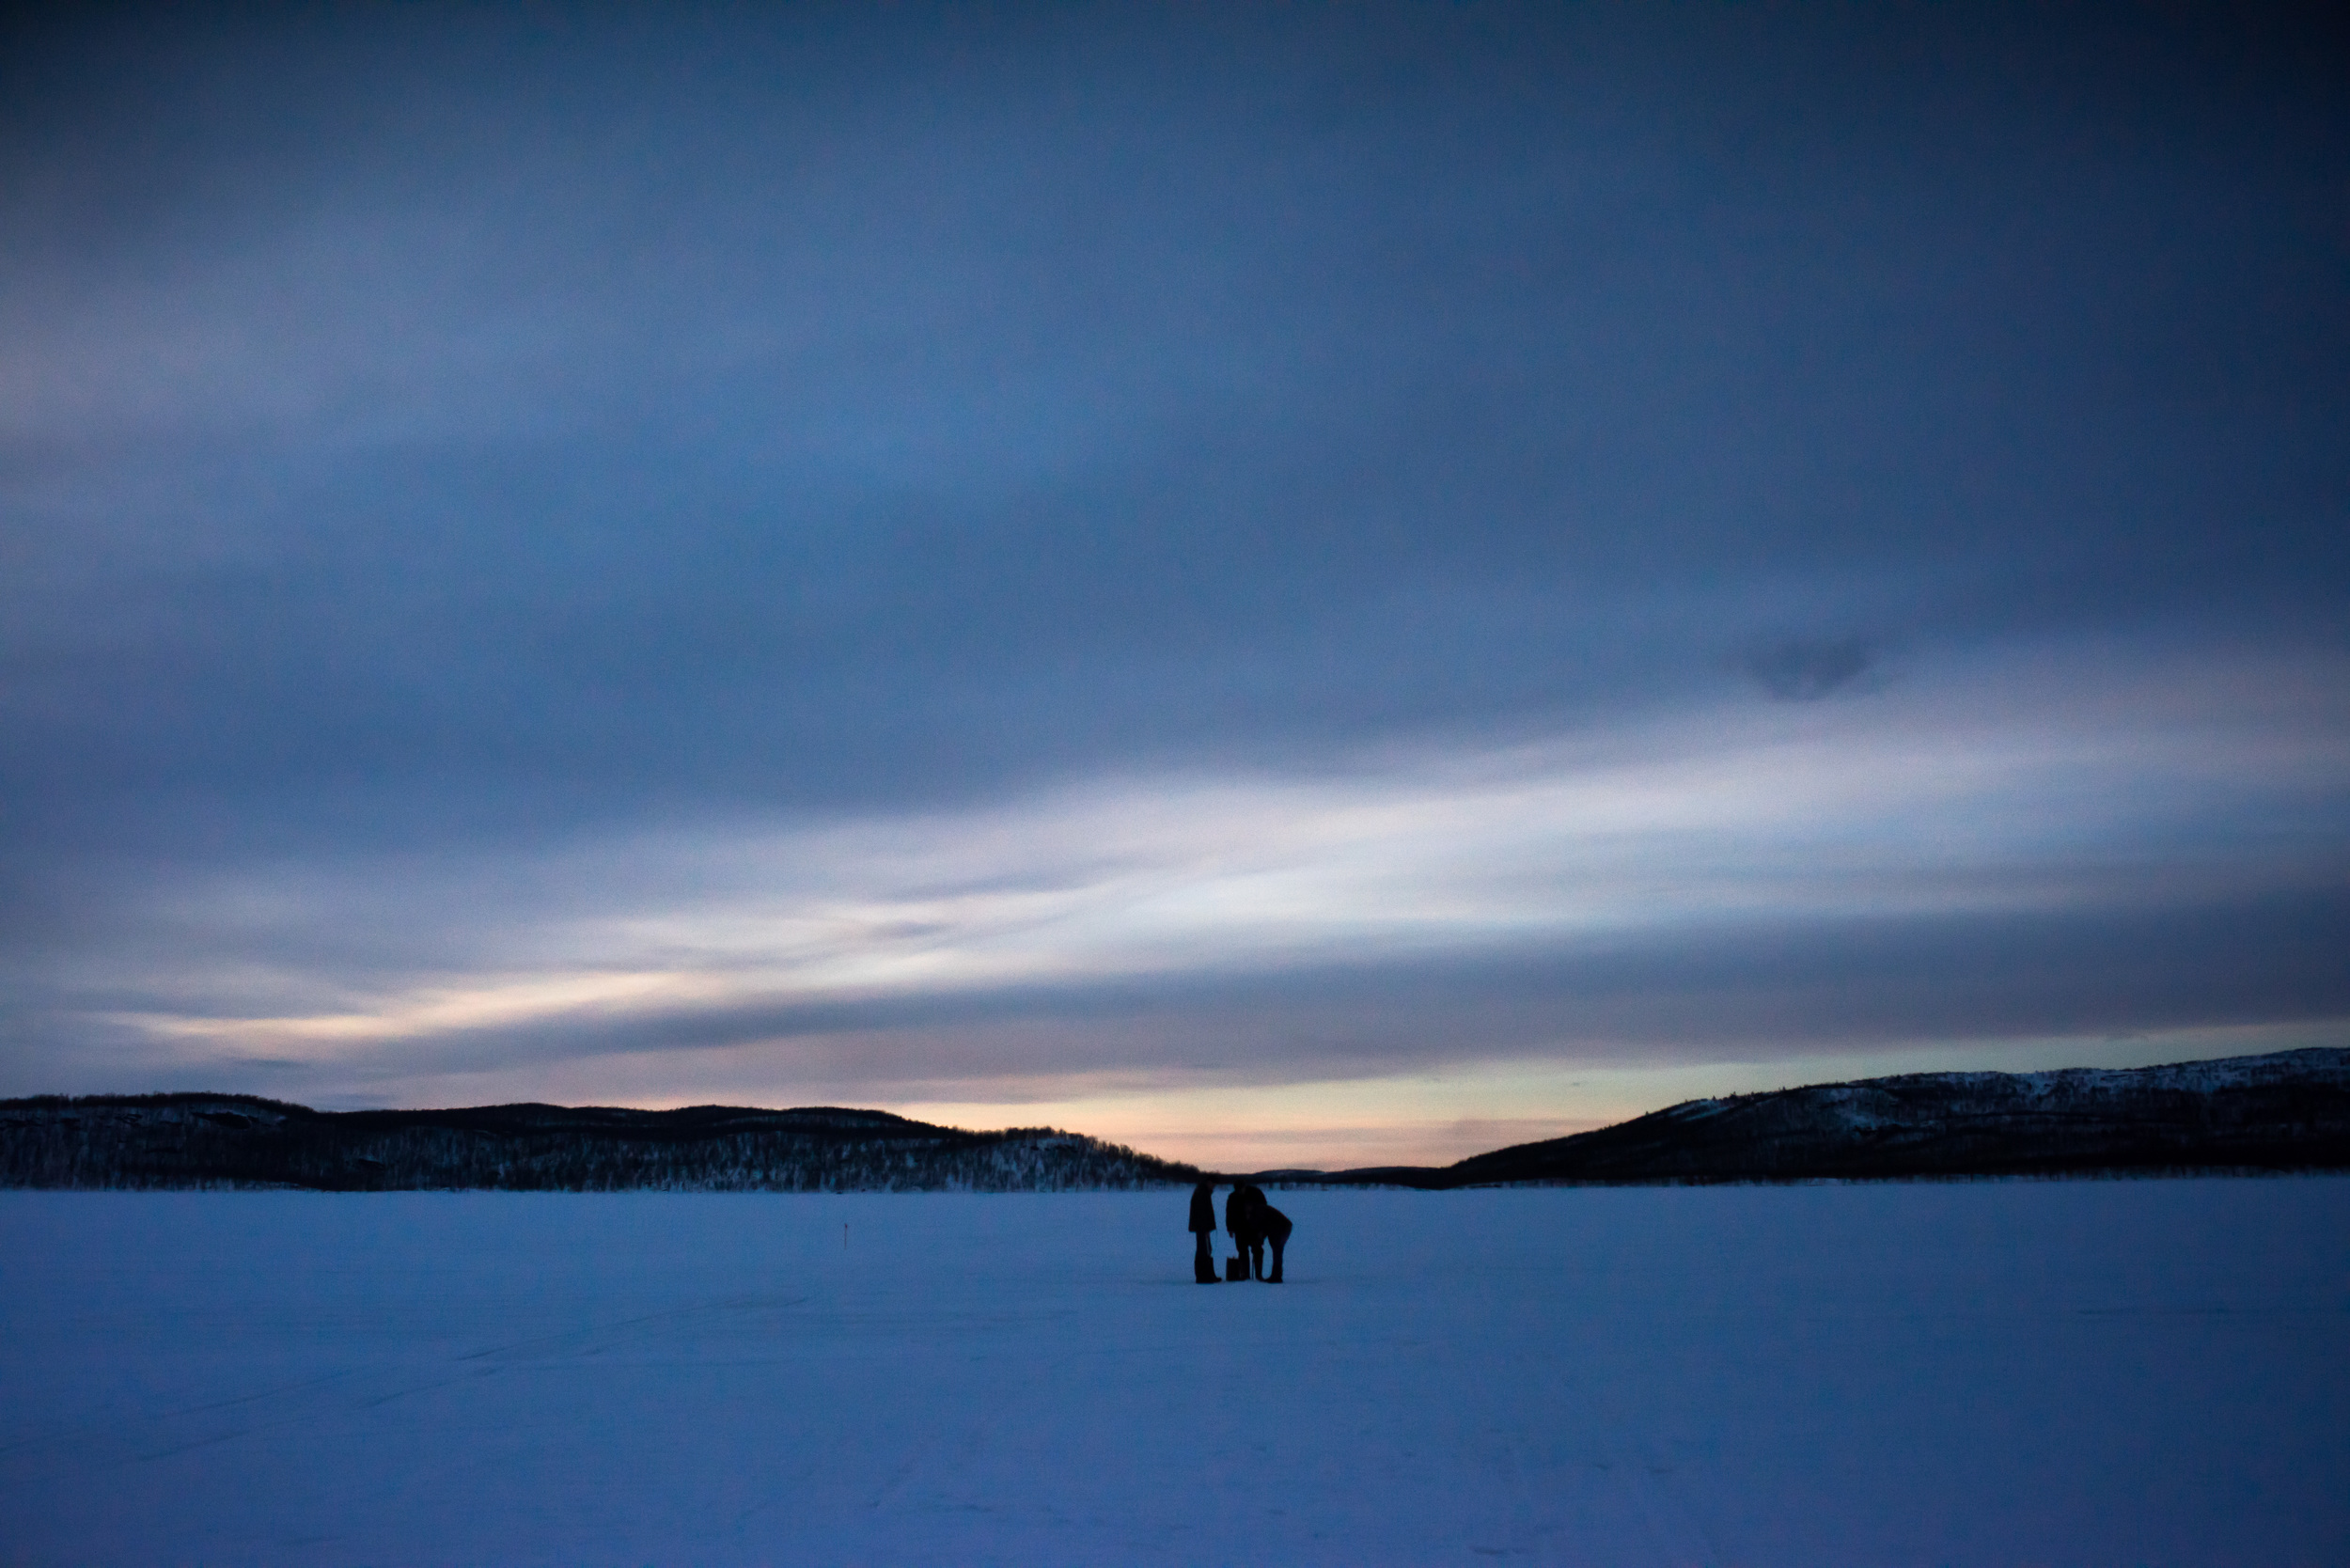 fishingshackmurmansk-05343.jpg